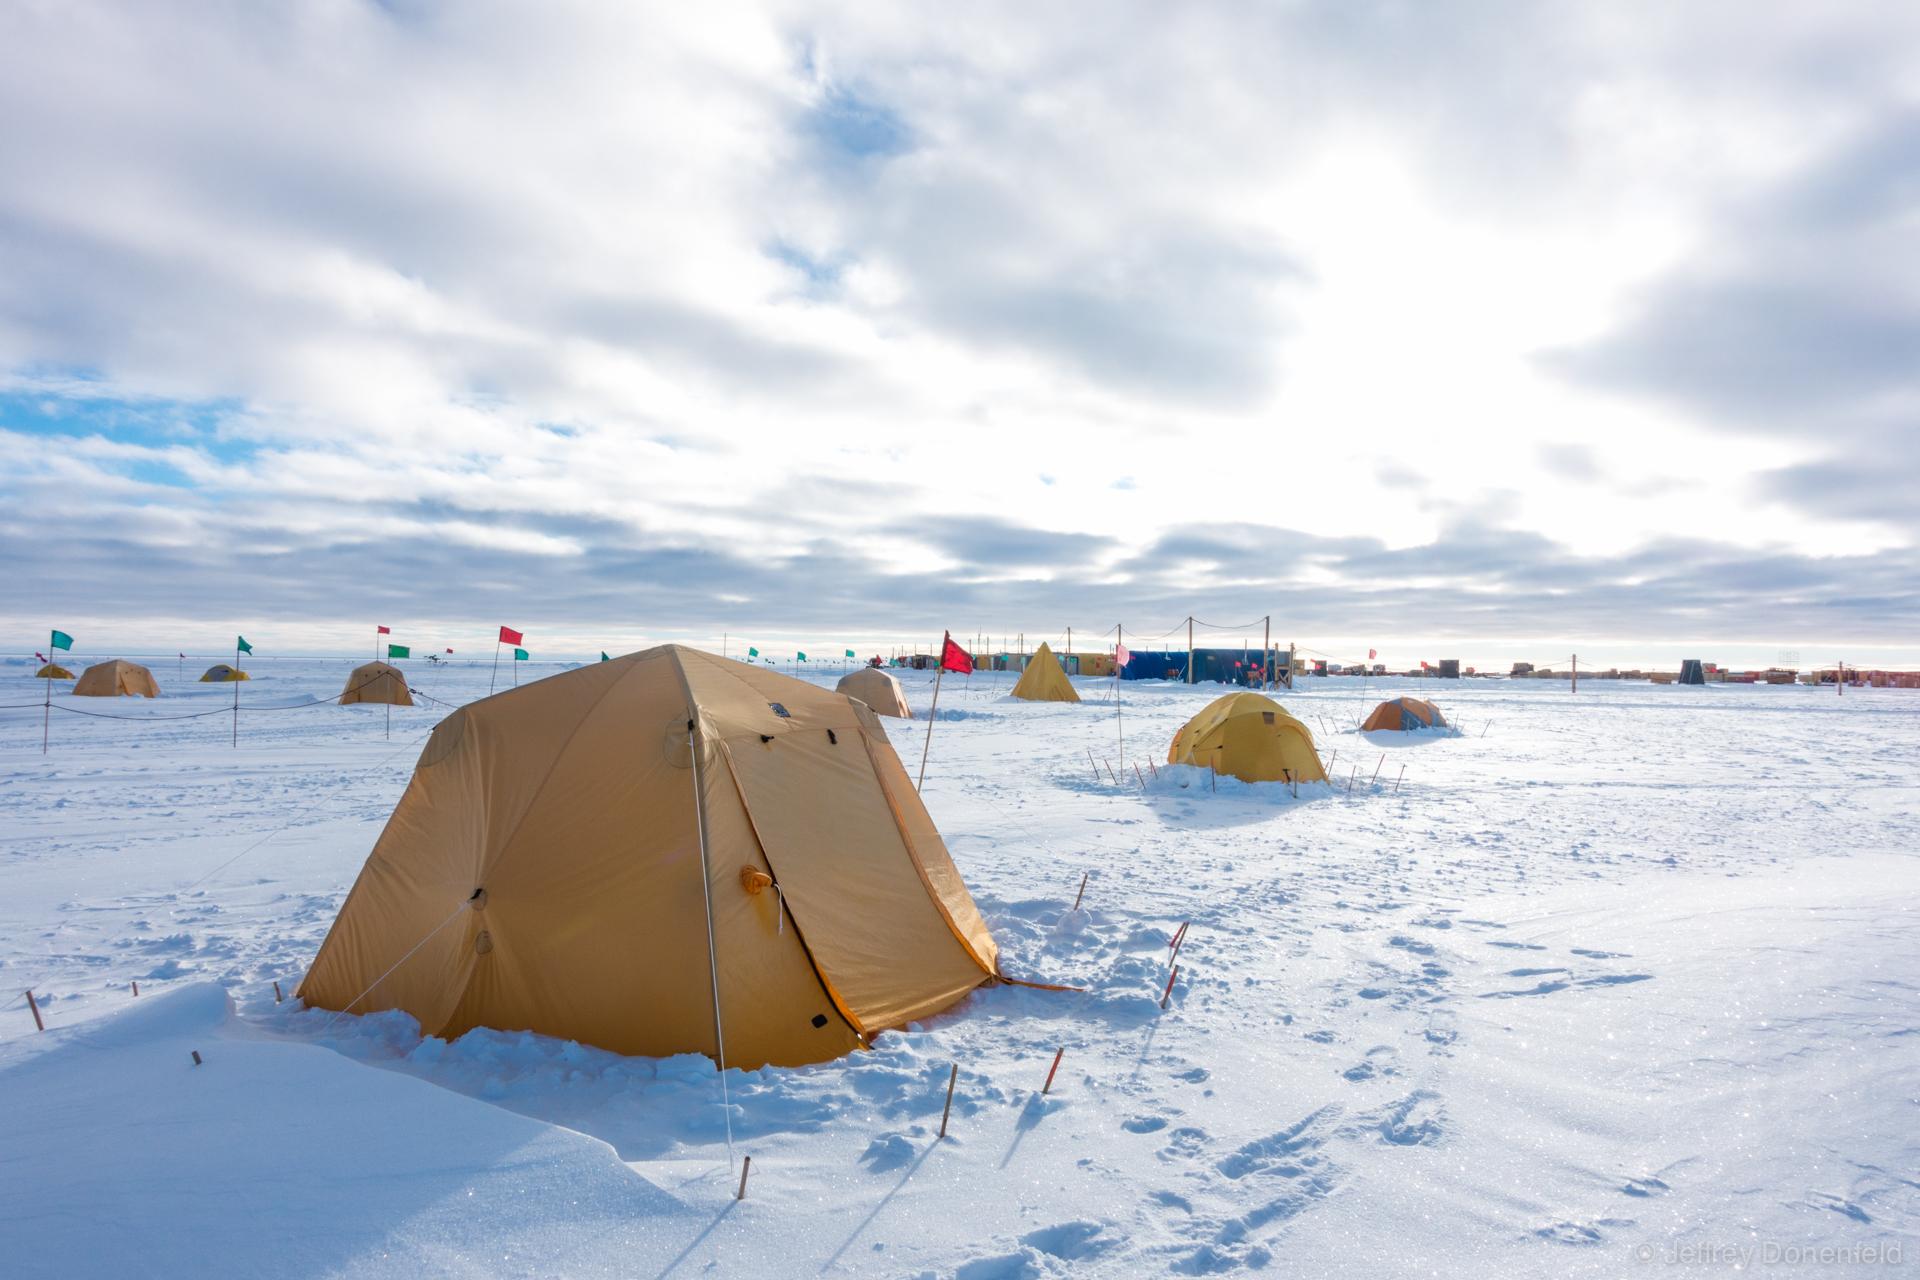 DSC02188-2015-01-09 Tent City-Donenfeld-1920-WM